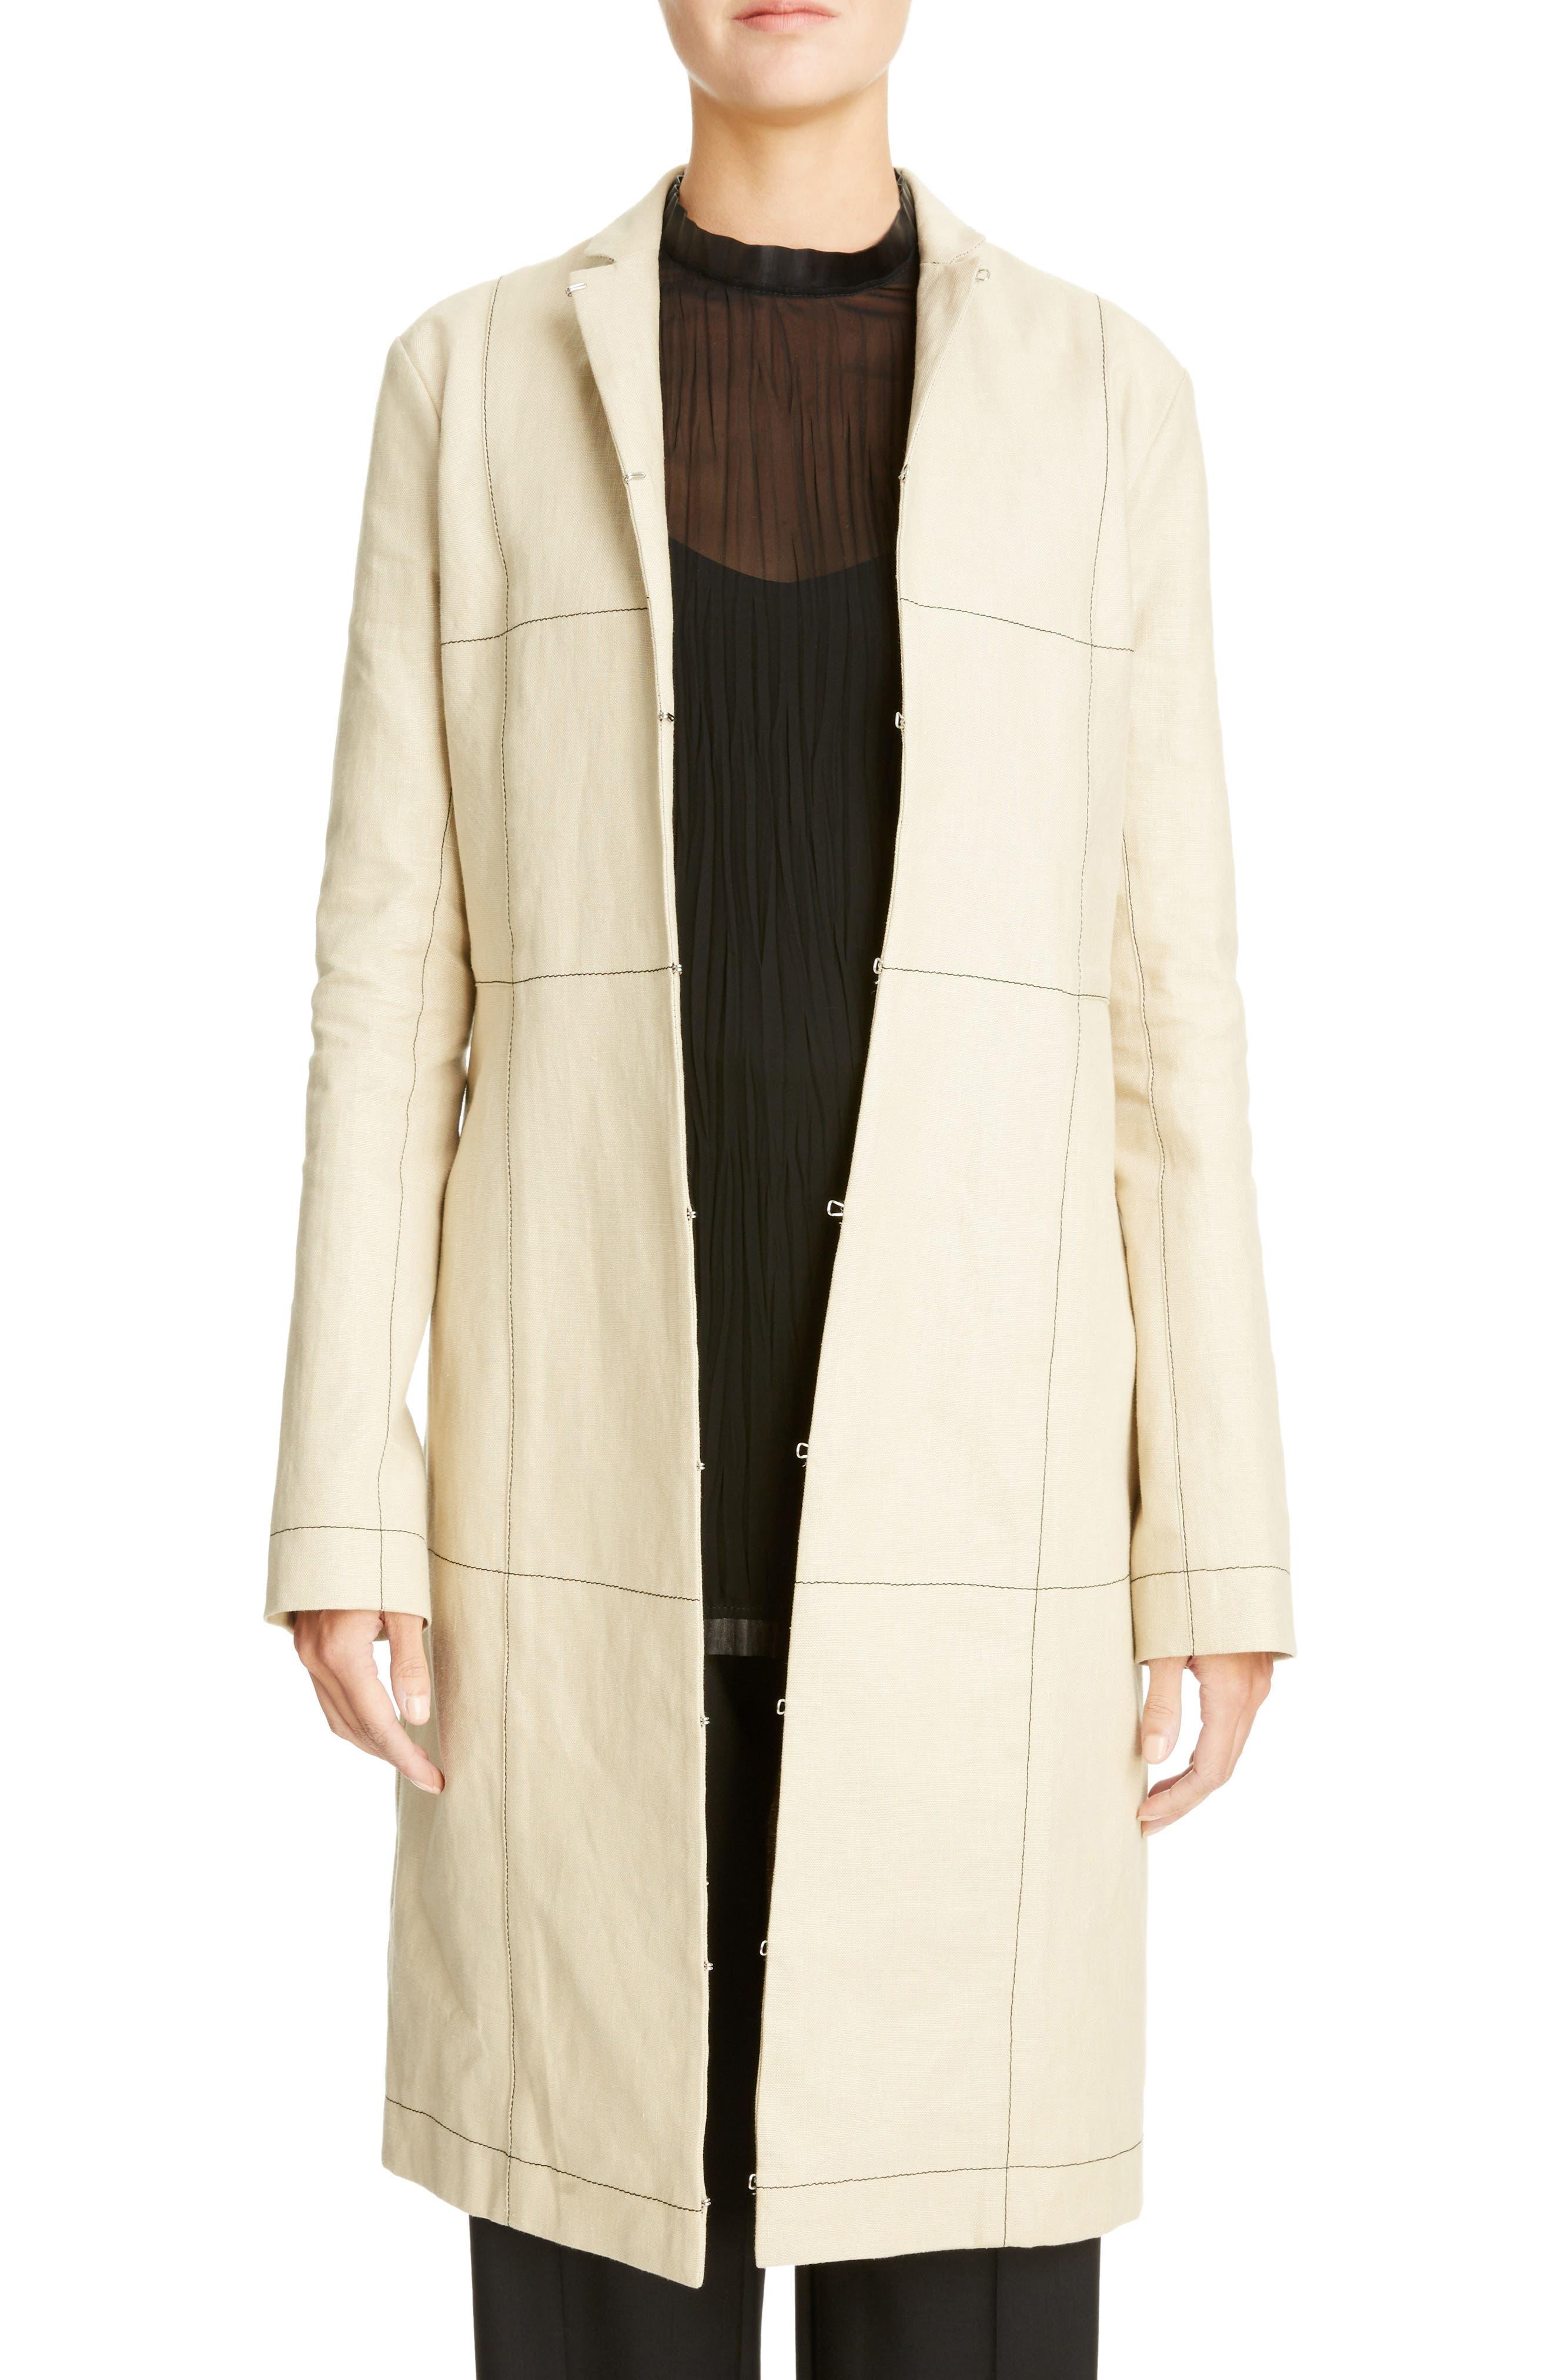 Topstitched Linen Coat,                             Main thumbnail 1, color,                             Beige